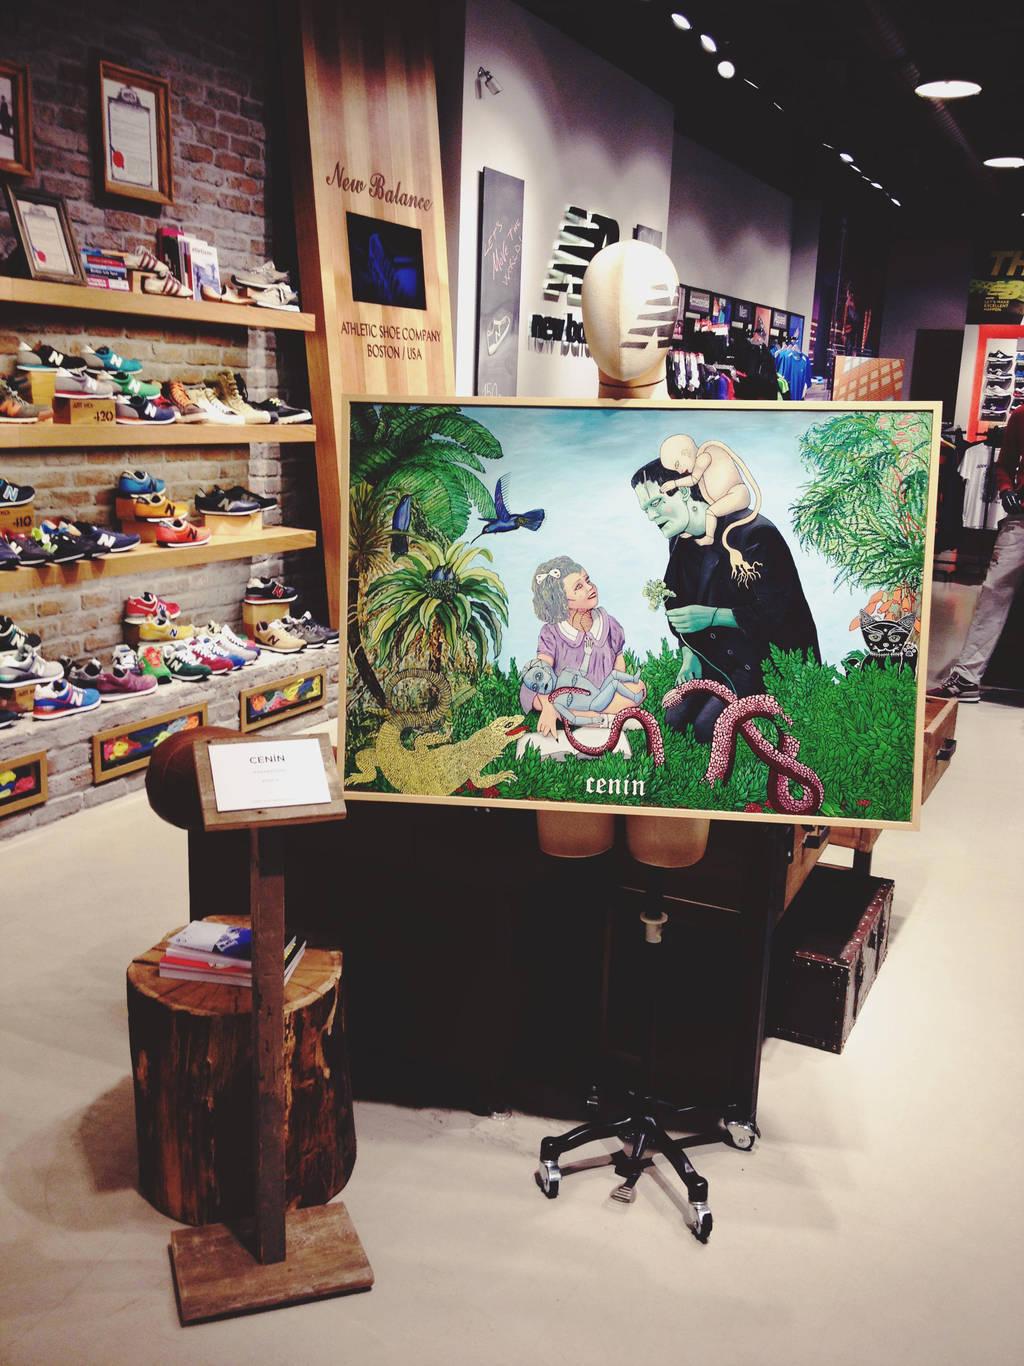 Frankeden in New Balance shop at Zorlu Center by selfregion